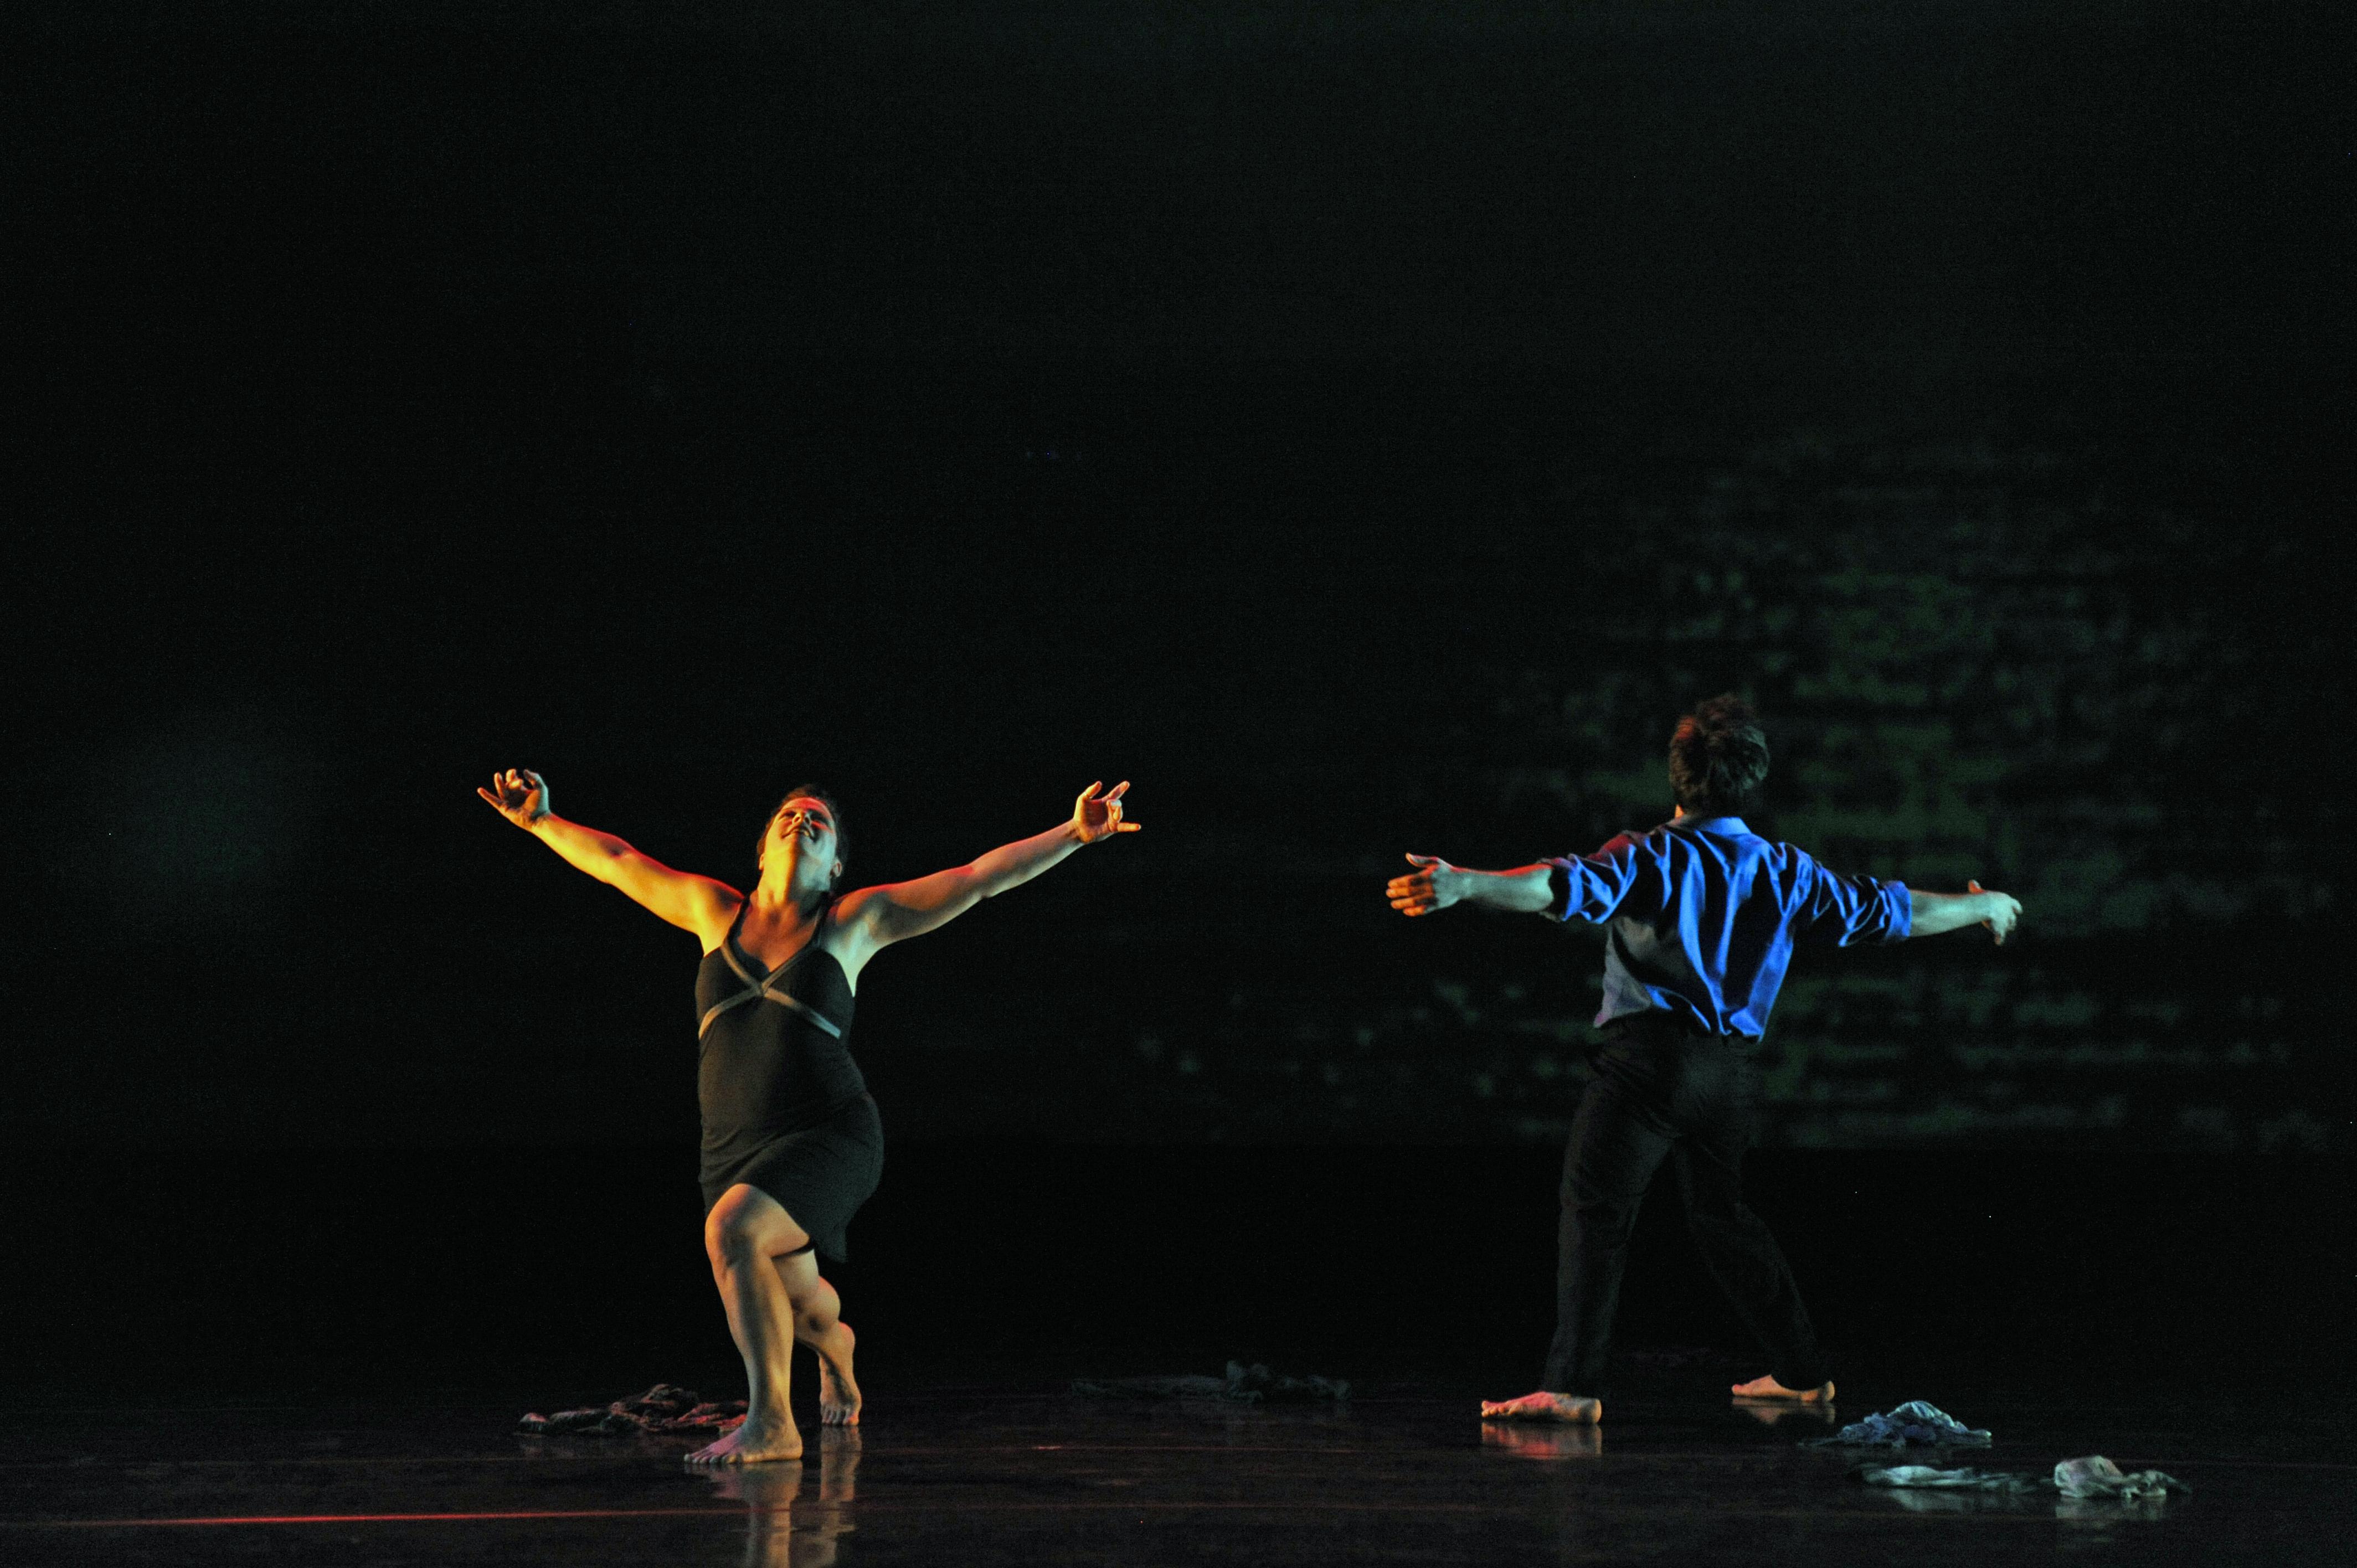 Alive (2010)